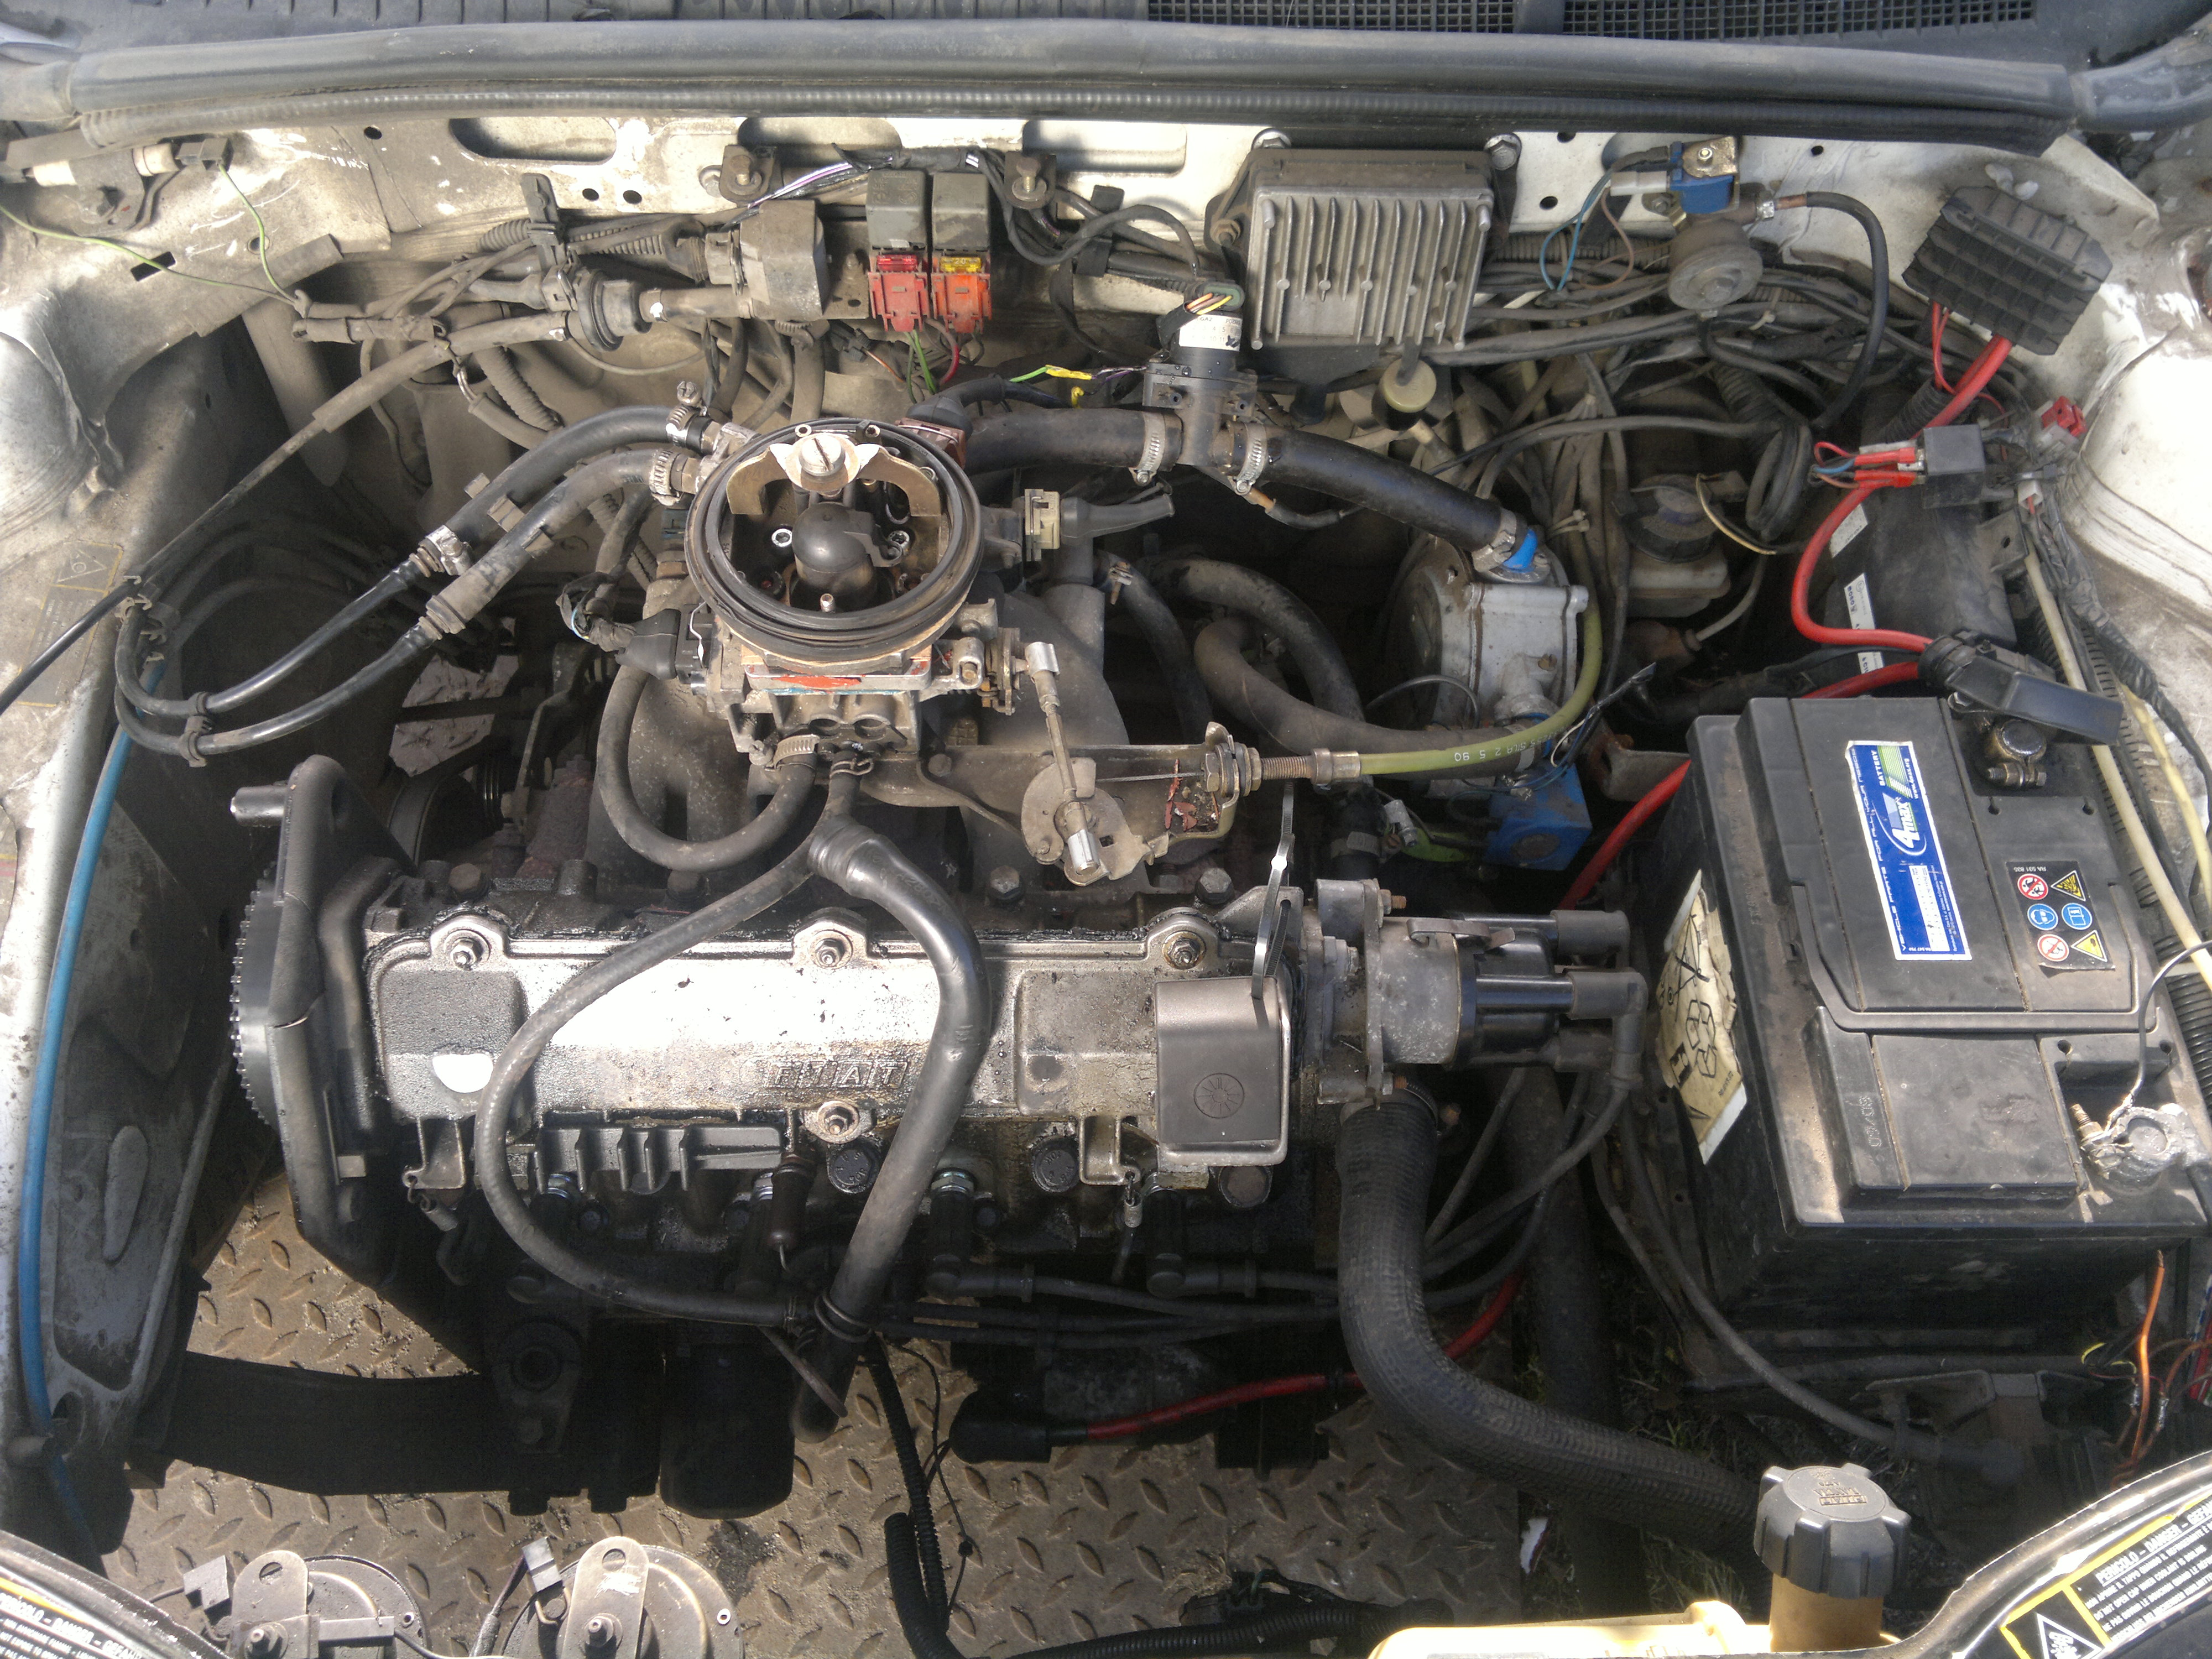 Fiat Tipo 1,4 AGT cat.i.e LPG - nie odpala na Pb